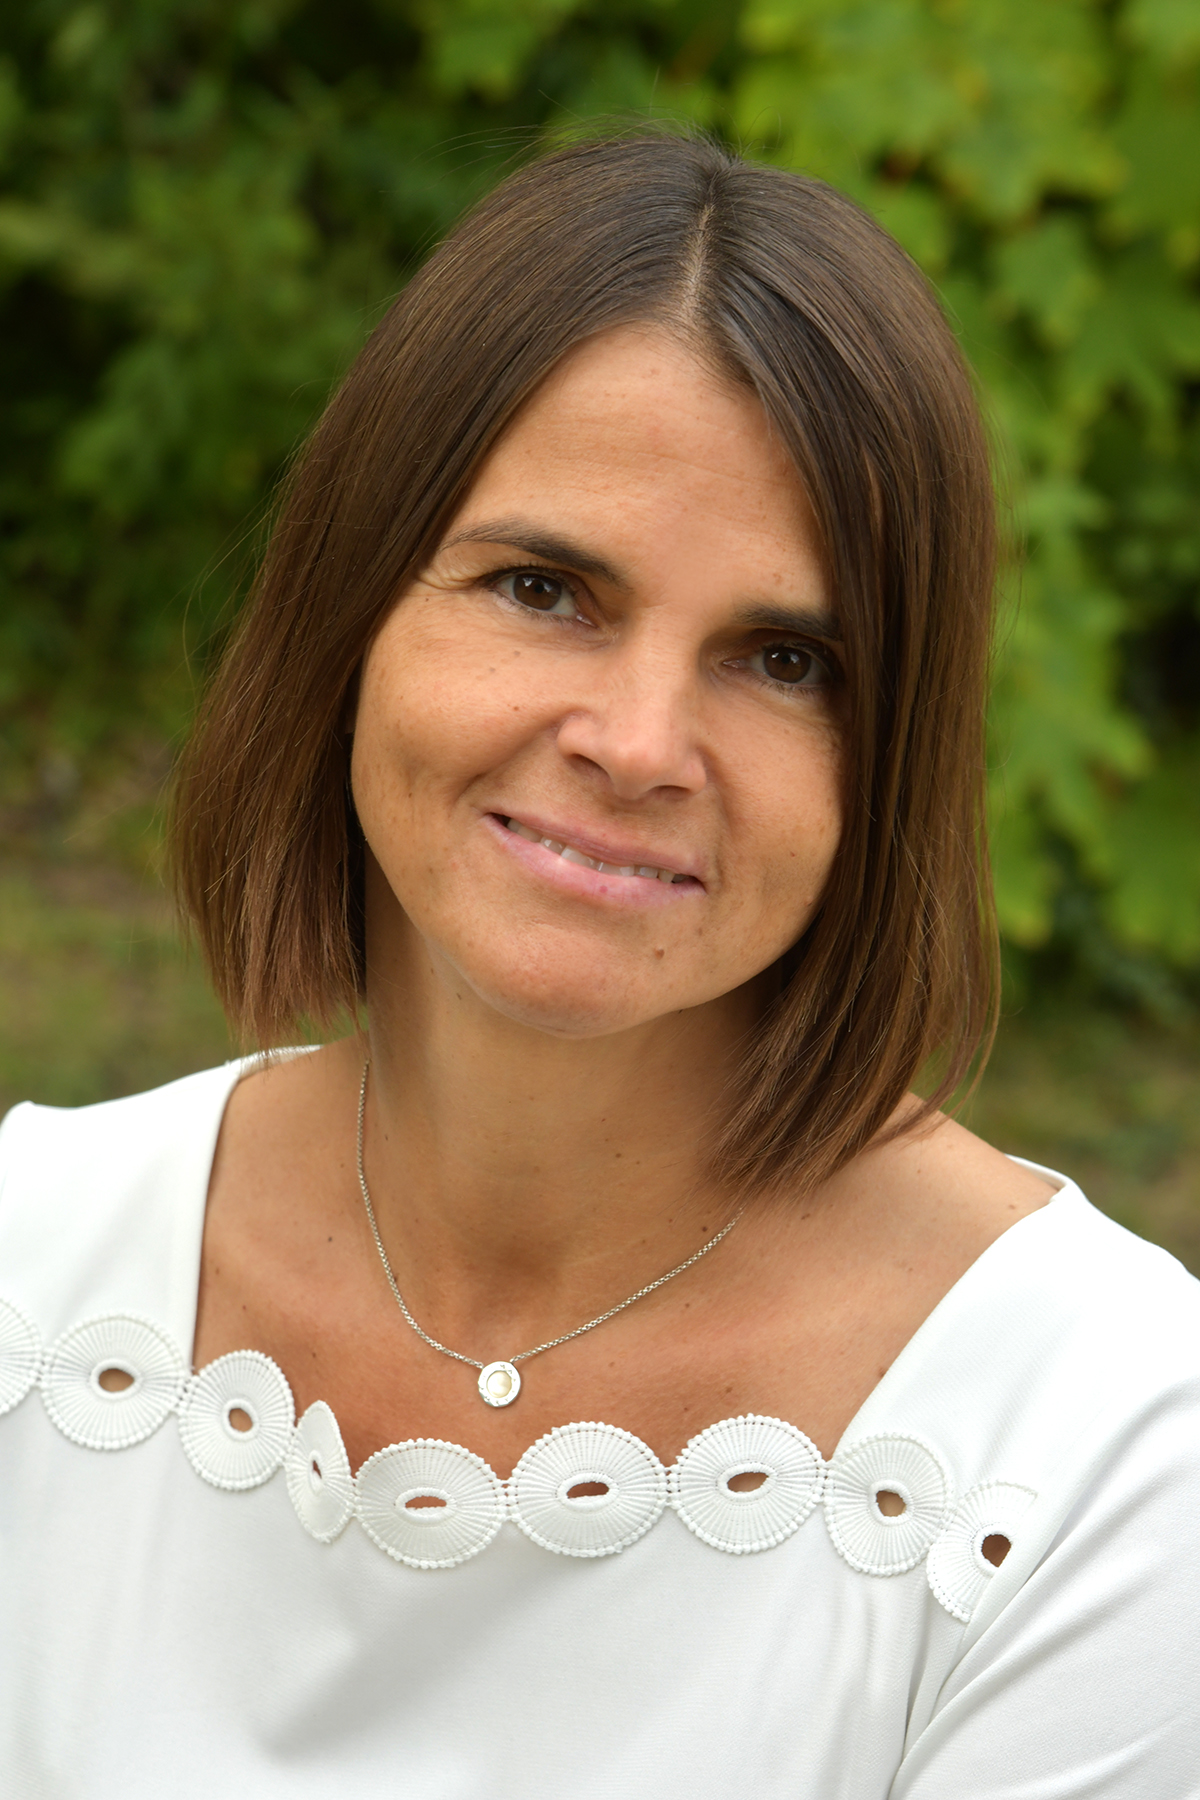 Sandra Schwendner